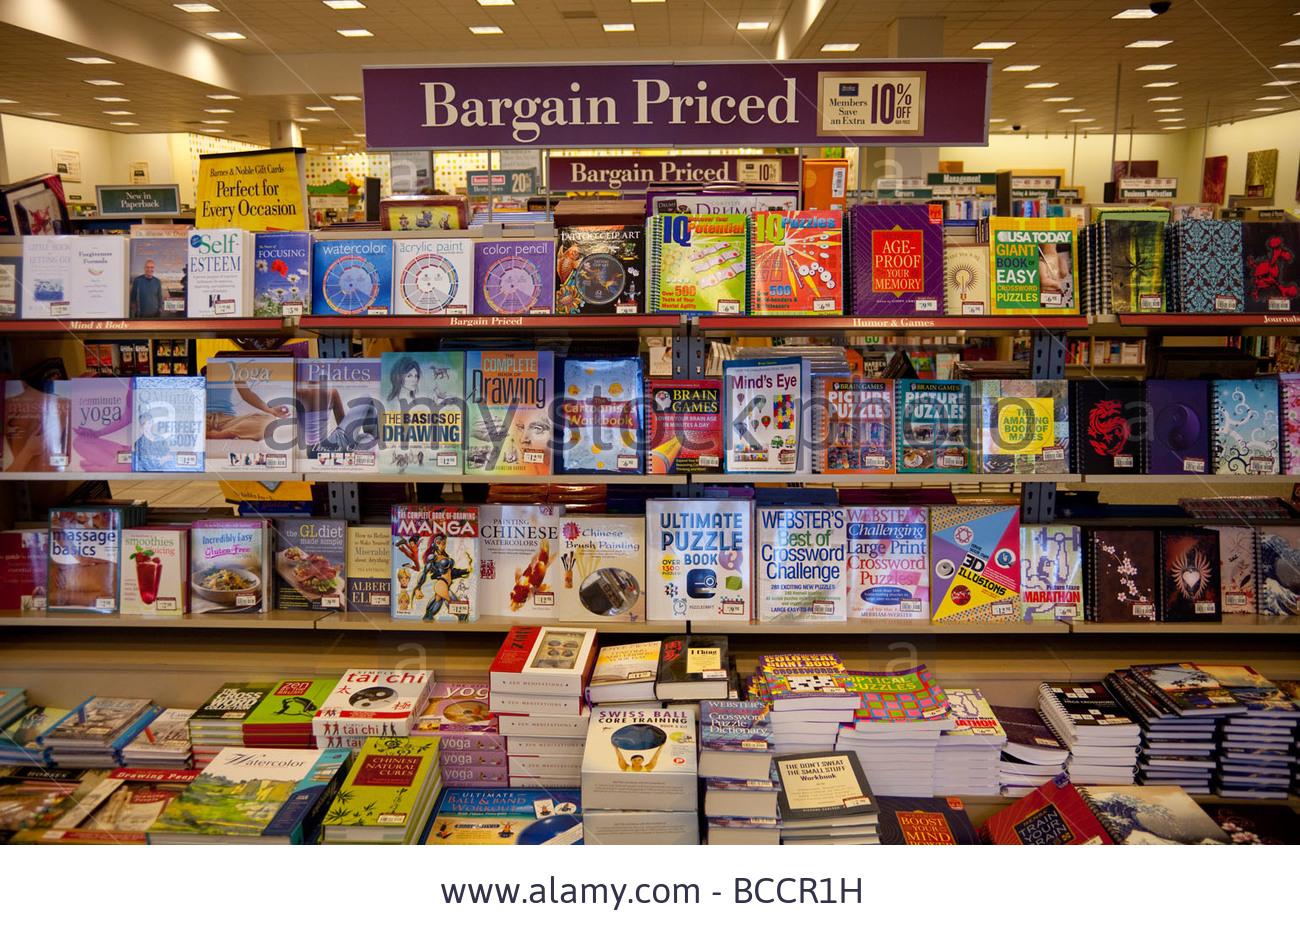 Coleccionar libros sin arruinarnos mi ventana favorita - Almacen de libreria ...